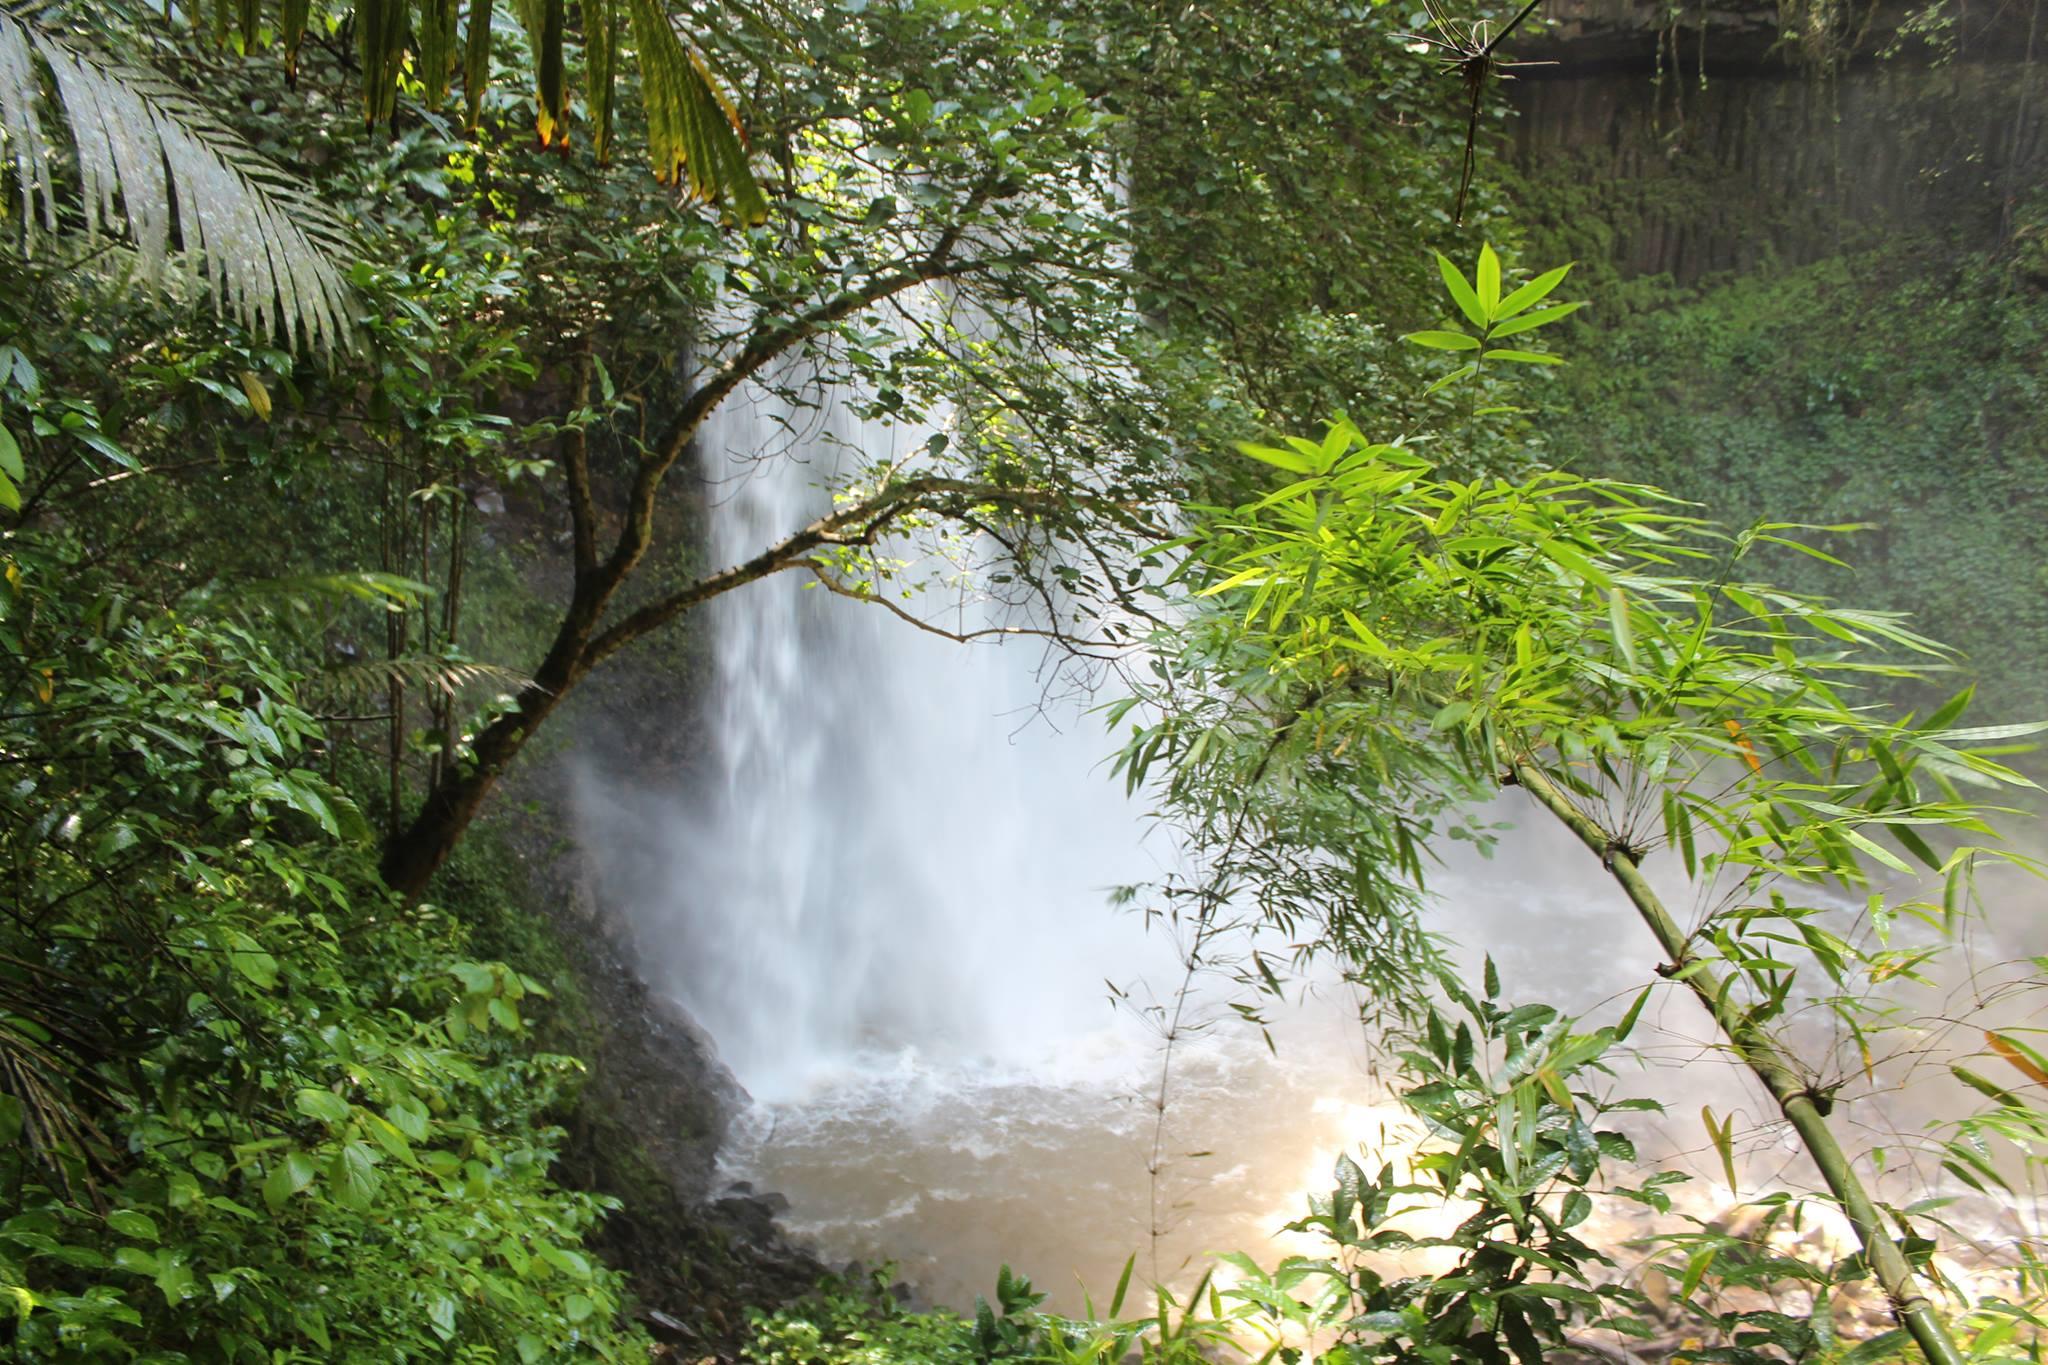 Green Cultural Travel - Cambodia - Mondulkiri - Waterfall in the jungle